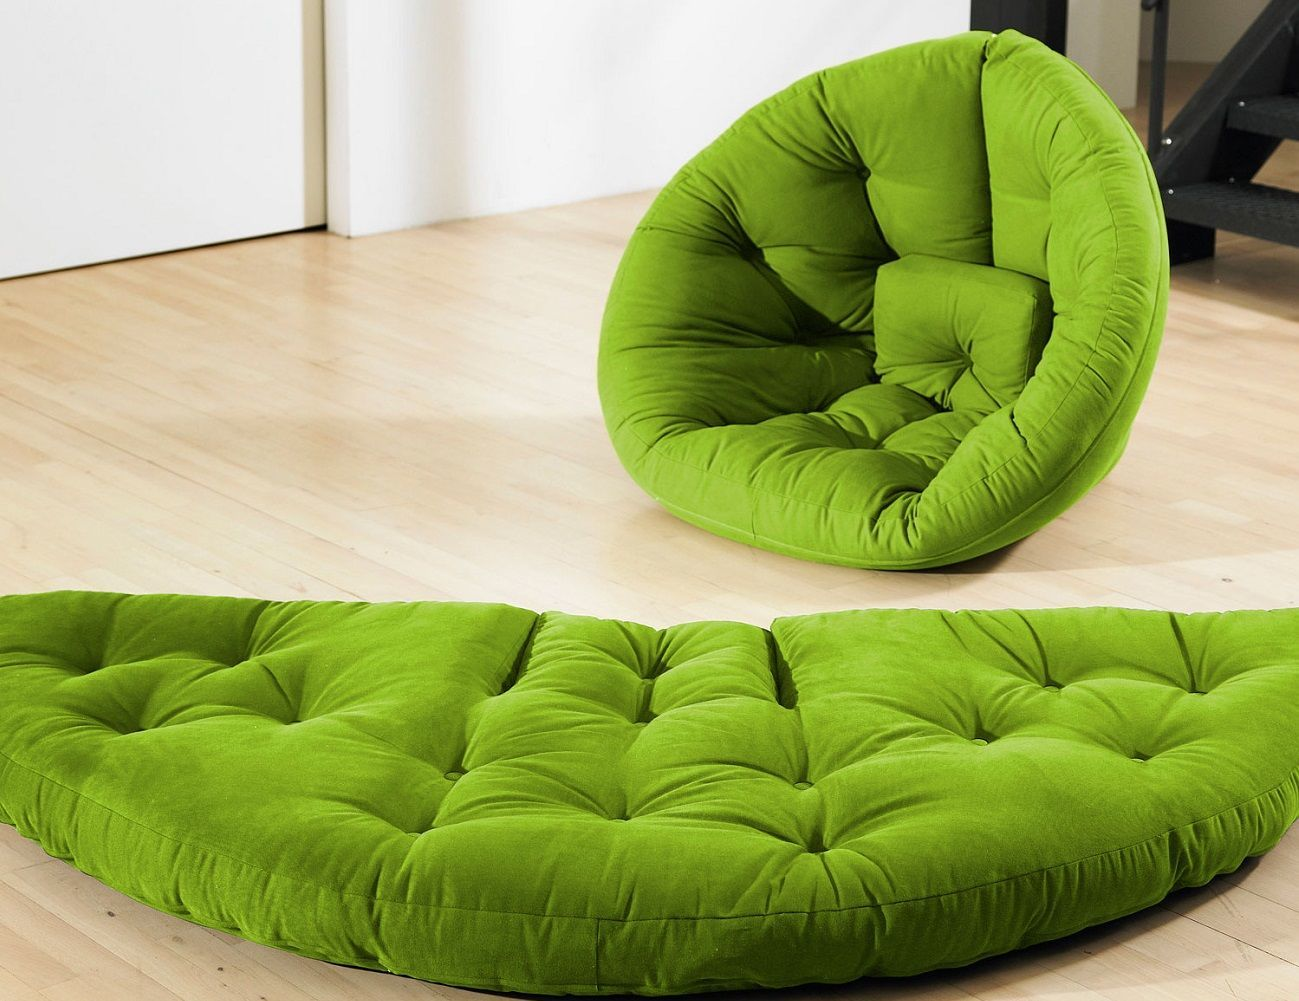 bed herpowerhustle futon bring mattressherpowerhustle in comforts room and the chair more mattress add com with